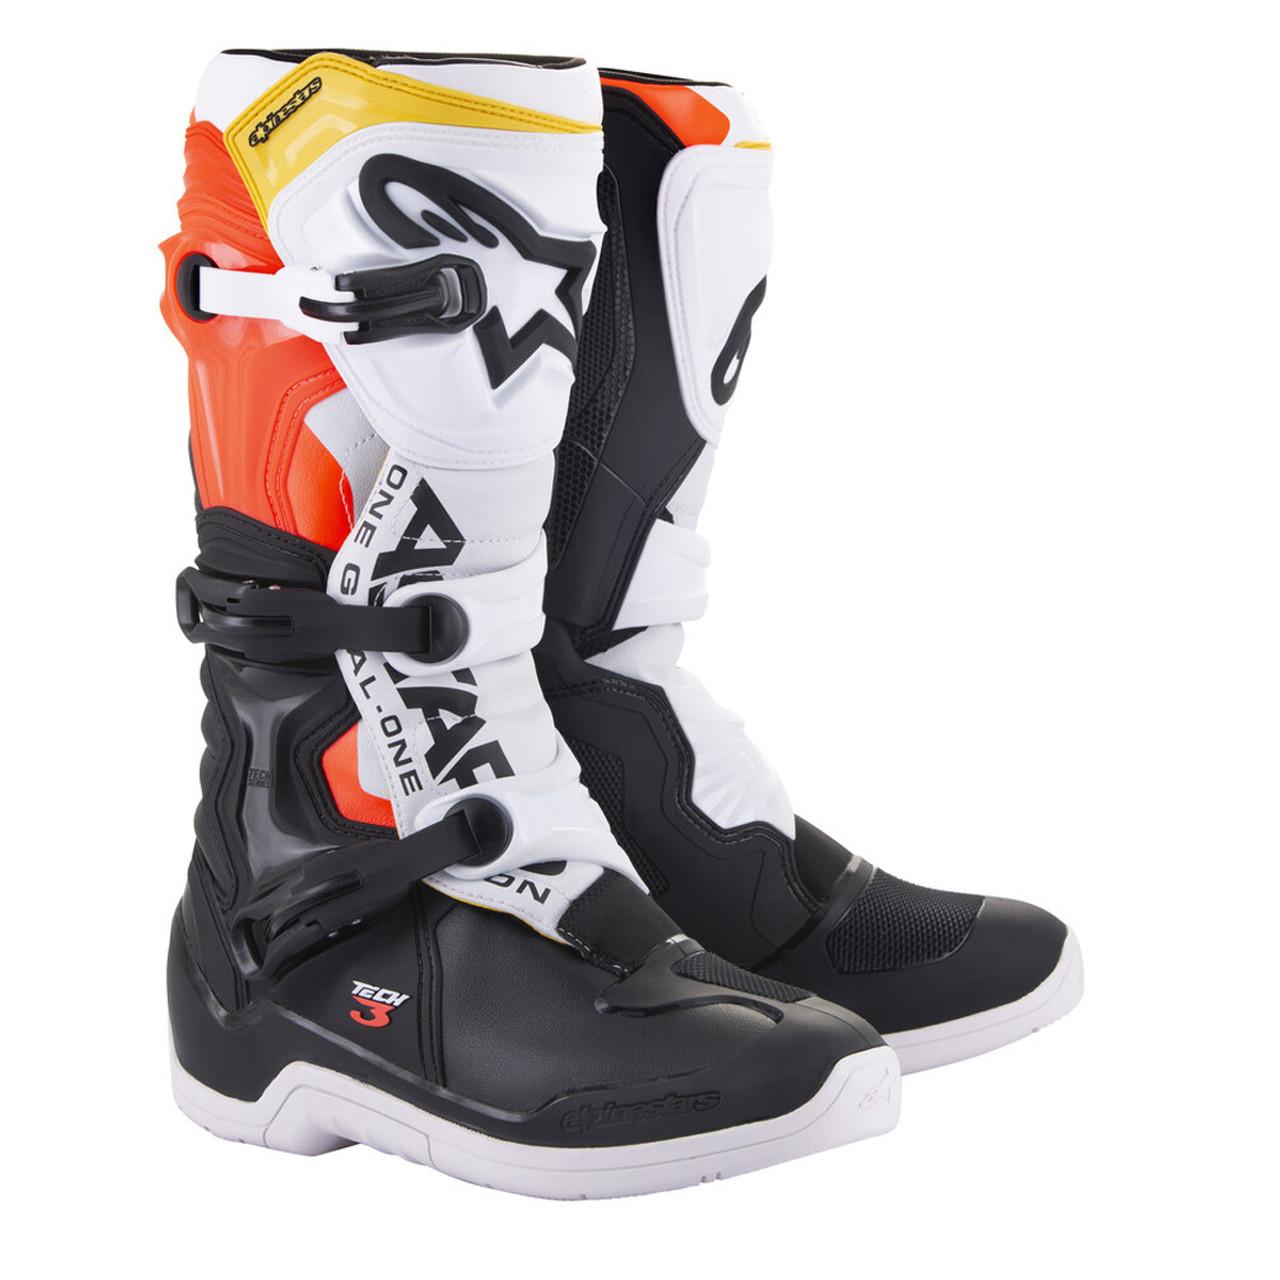 https://cdn11.bigcommerce.com/s-sfoxy4qm75/images/stencil/1280x1280/products/6747/54042/alpinestars-tech-3-2020-boots__66180.1601520178.jpg?c=2